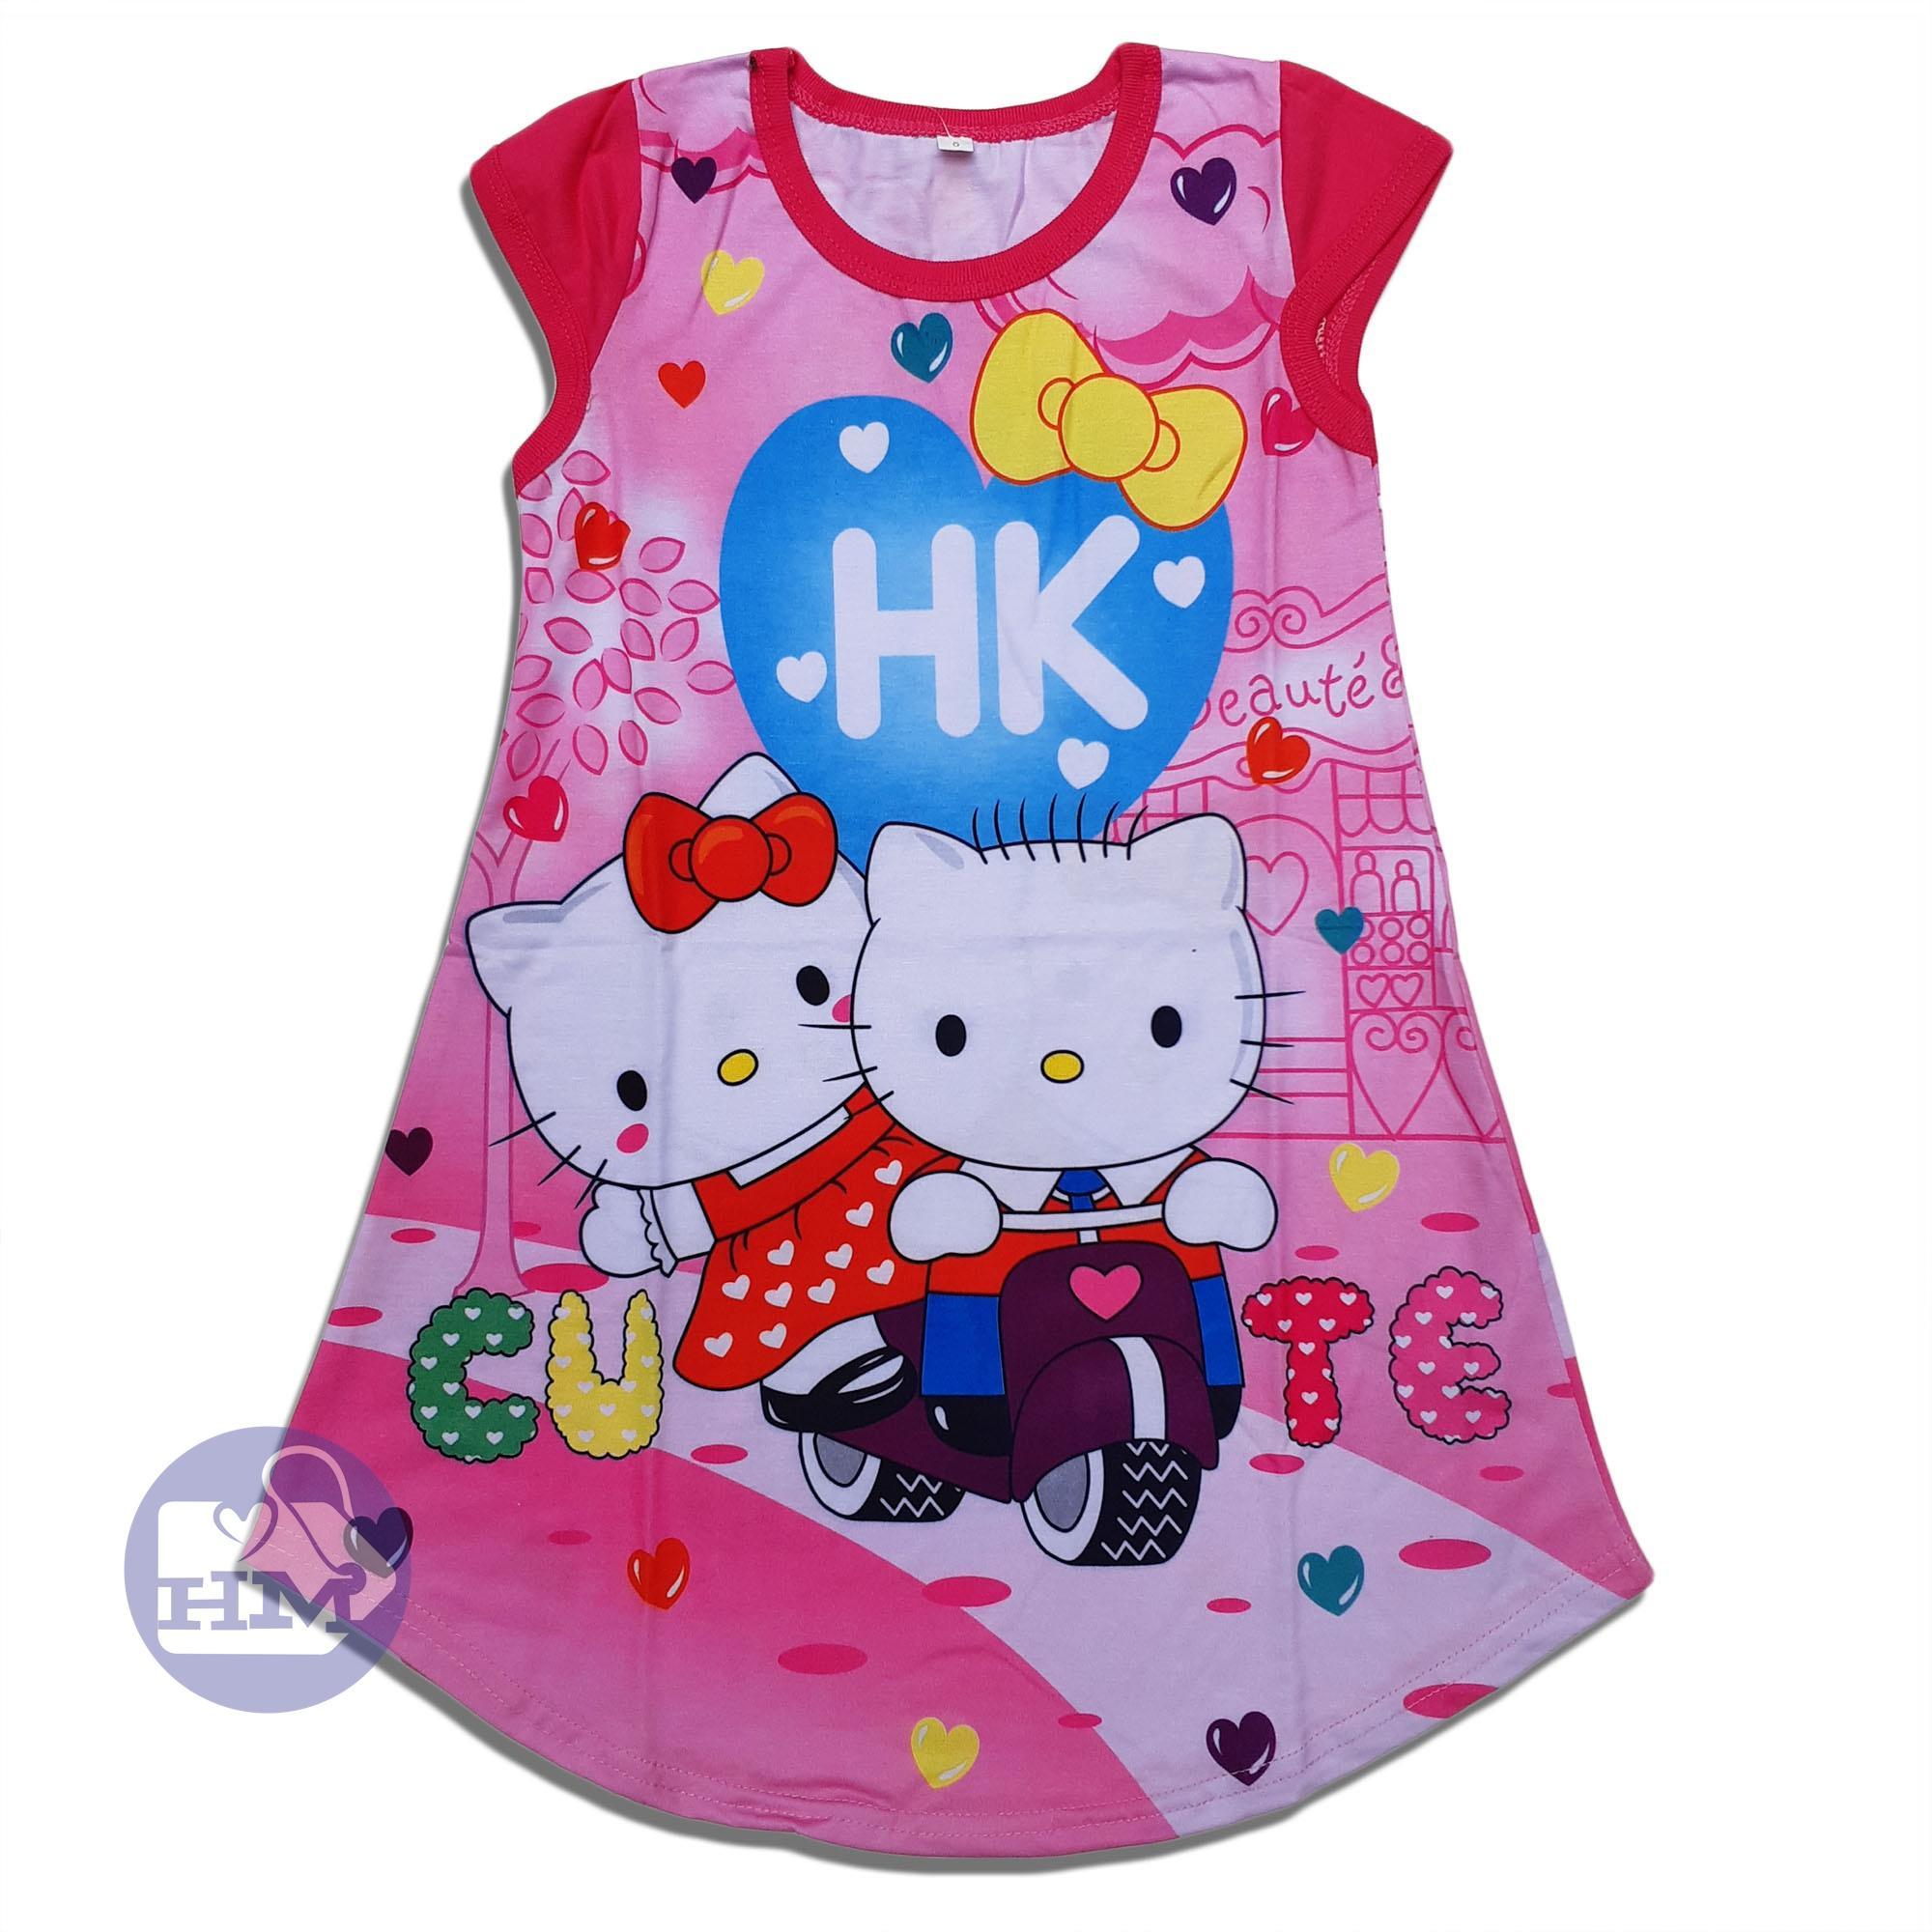 Hm Baju Dress Anak Perempuan Hello Kitty By Hm Shopa Collection.